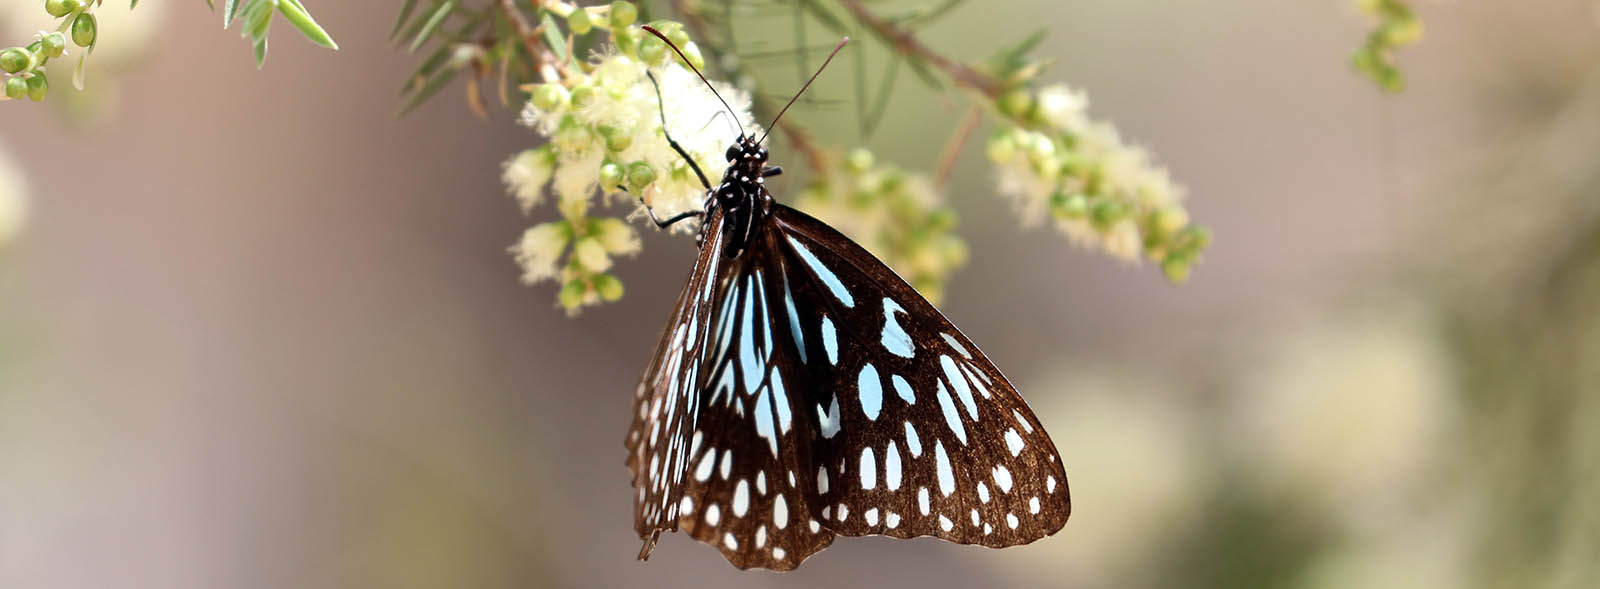 Tirumala hamata, 'Dark Blue Tiger Butterfly' (image by Damon Ramsey)